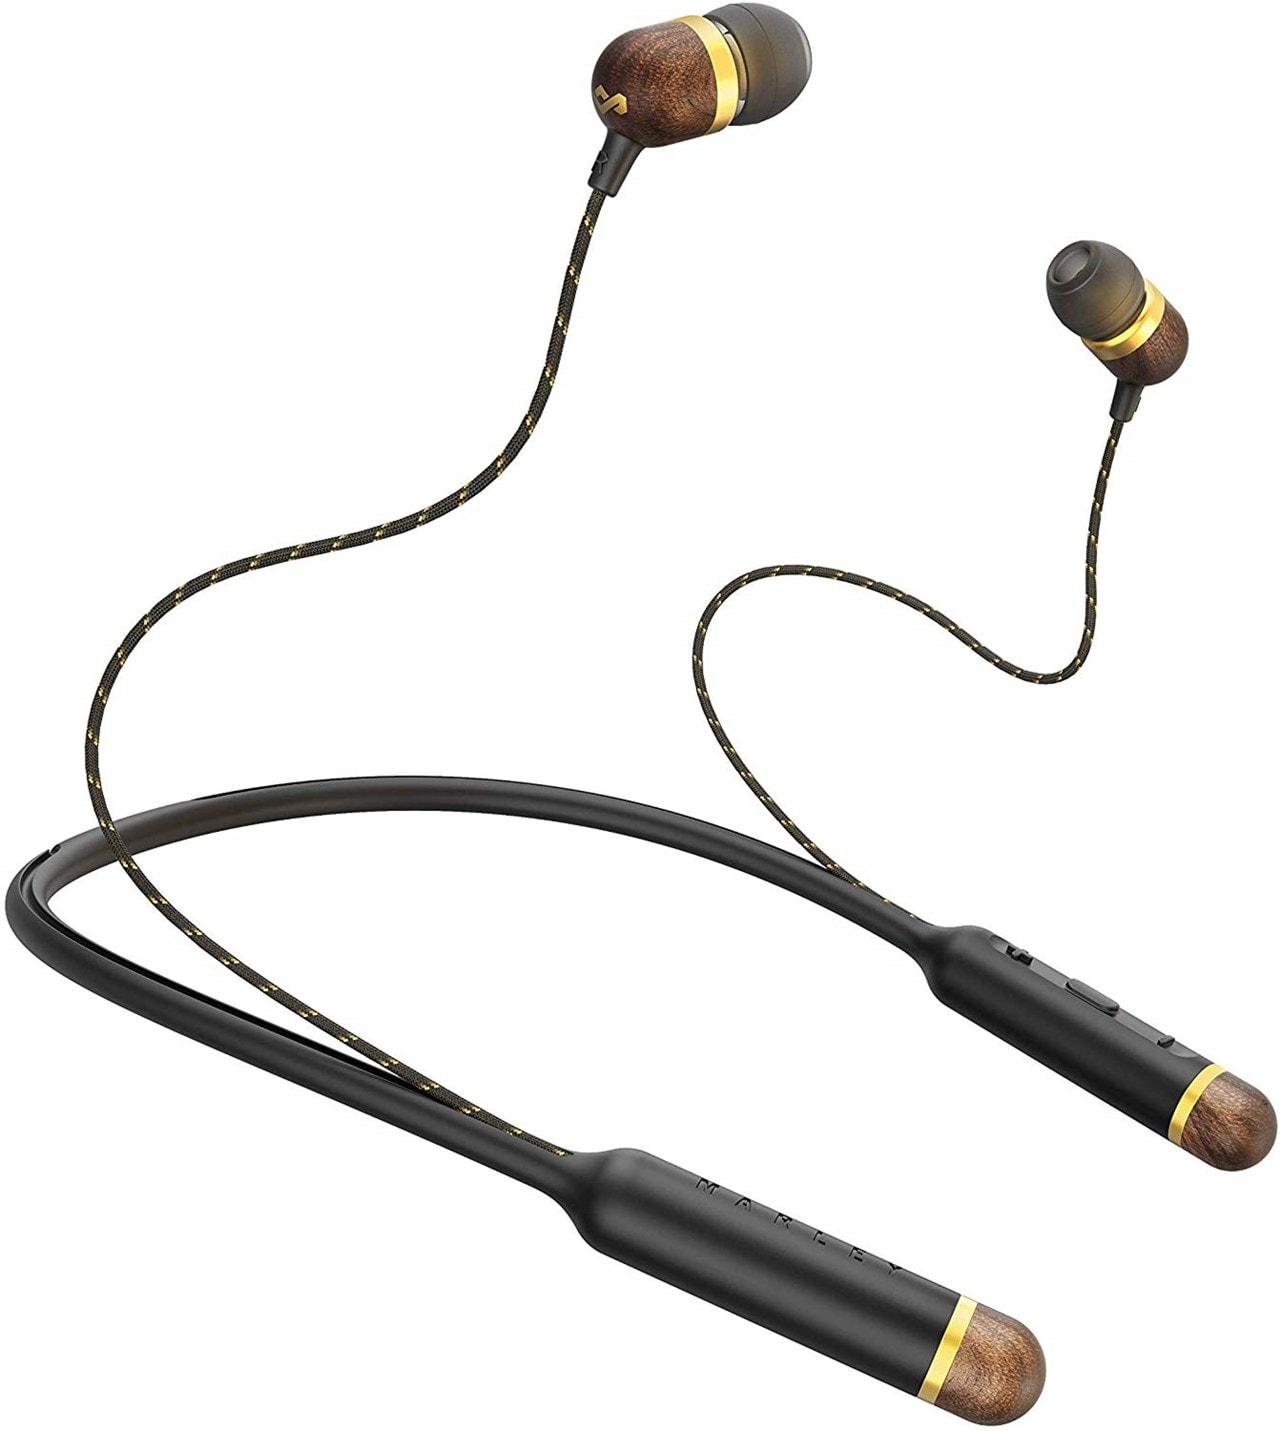 House Of Marley Smile Jamaica BT Brass Bluetooth Earphones (hmv Exclusive) - 1